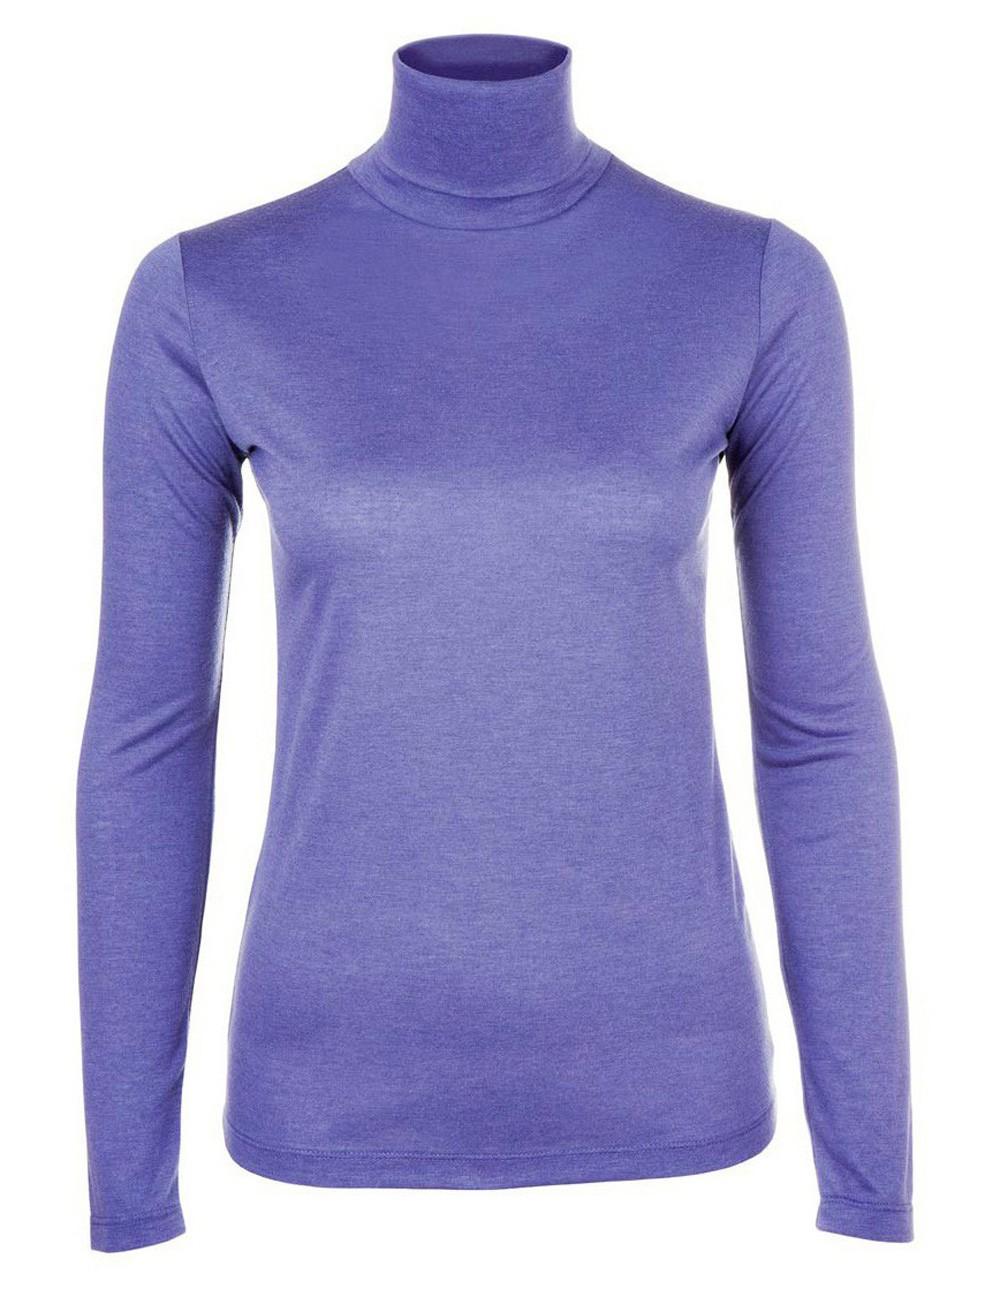 skibs rollkragen shirt azulin mode tops shirts langarmshirts. Black Bedroom Furniture Sets. Home Design Ideas